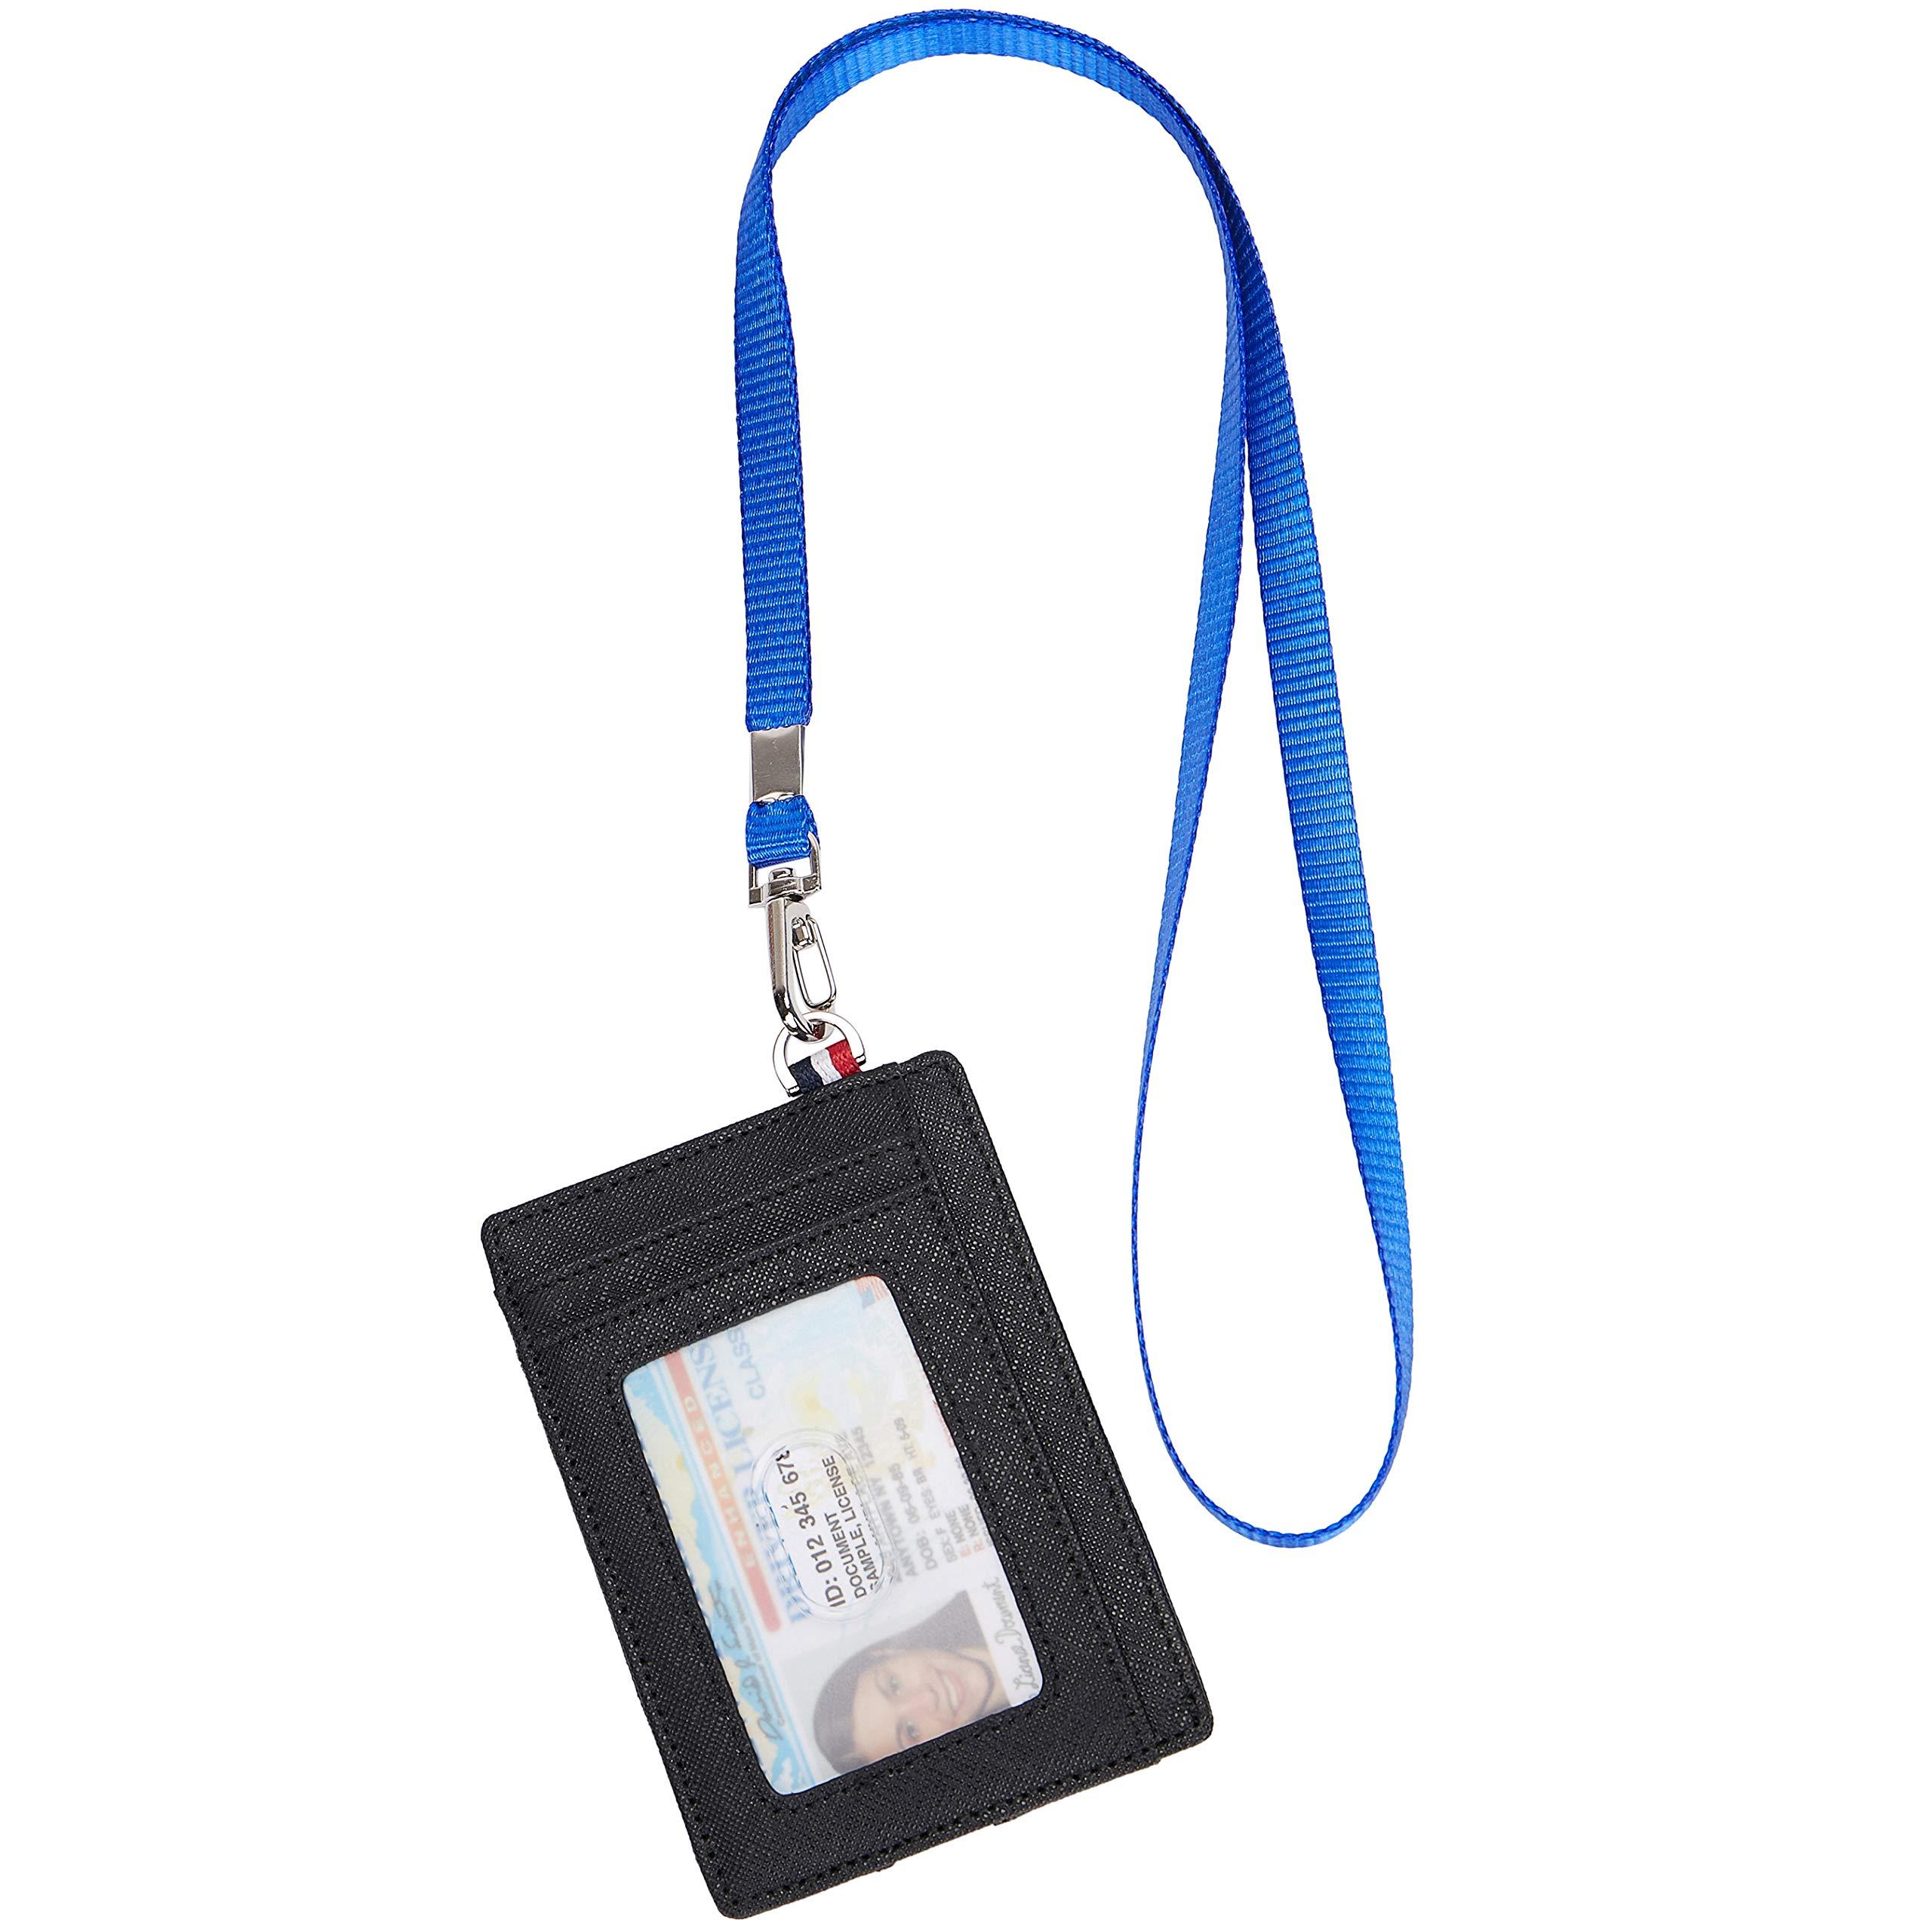 Small RFID Blocking Minimalist Credit Card Holder Pocket Slim Wallets for Men & Women by NEUX (Image #6)